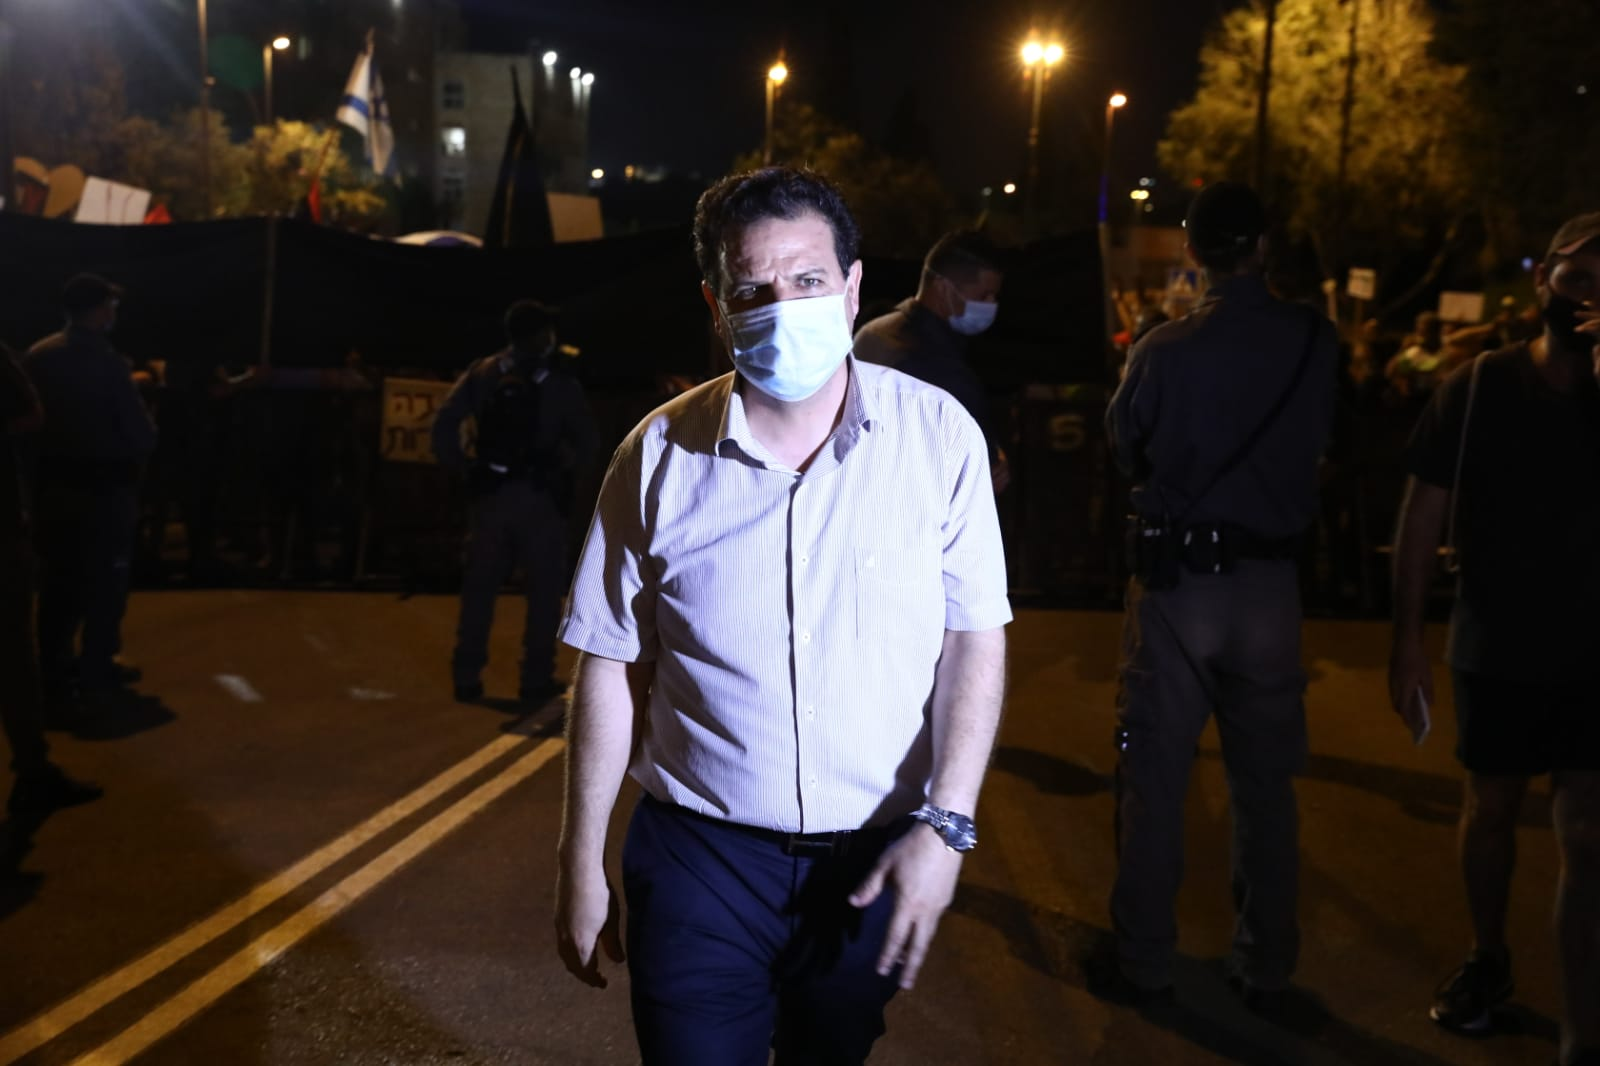 Joint List leader Ayman Odeh at the protest outside the Knesset, Jerusalem, July 21, 2020. (Oren Ziv)